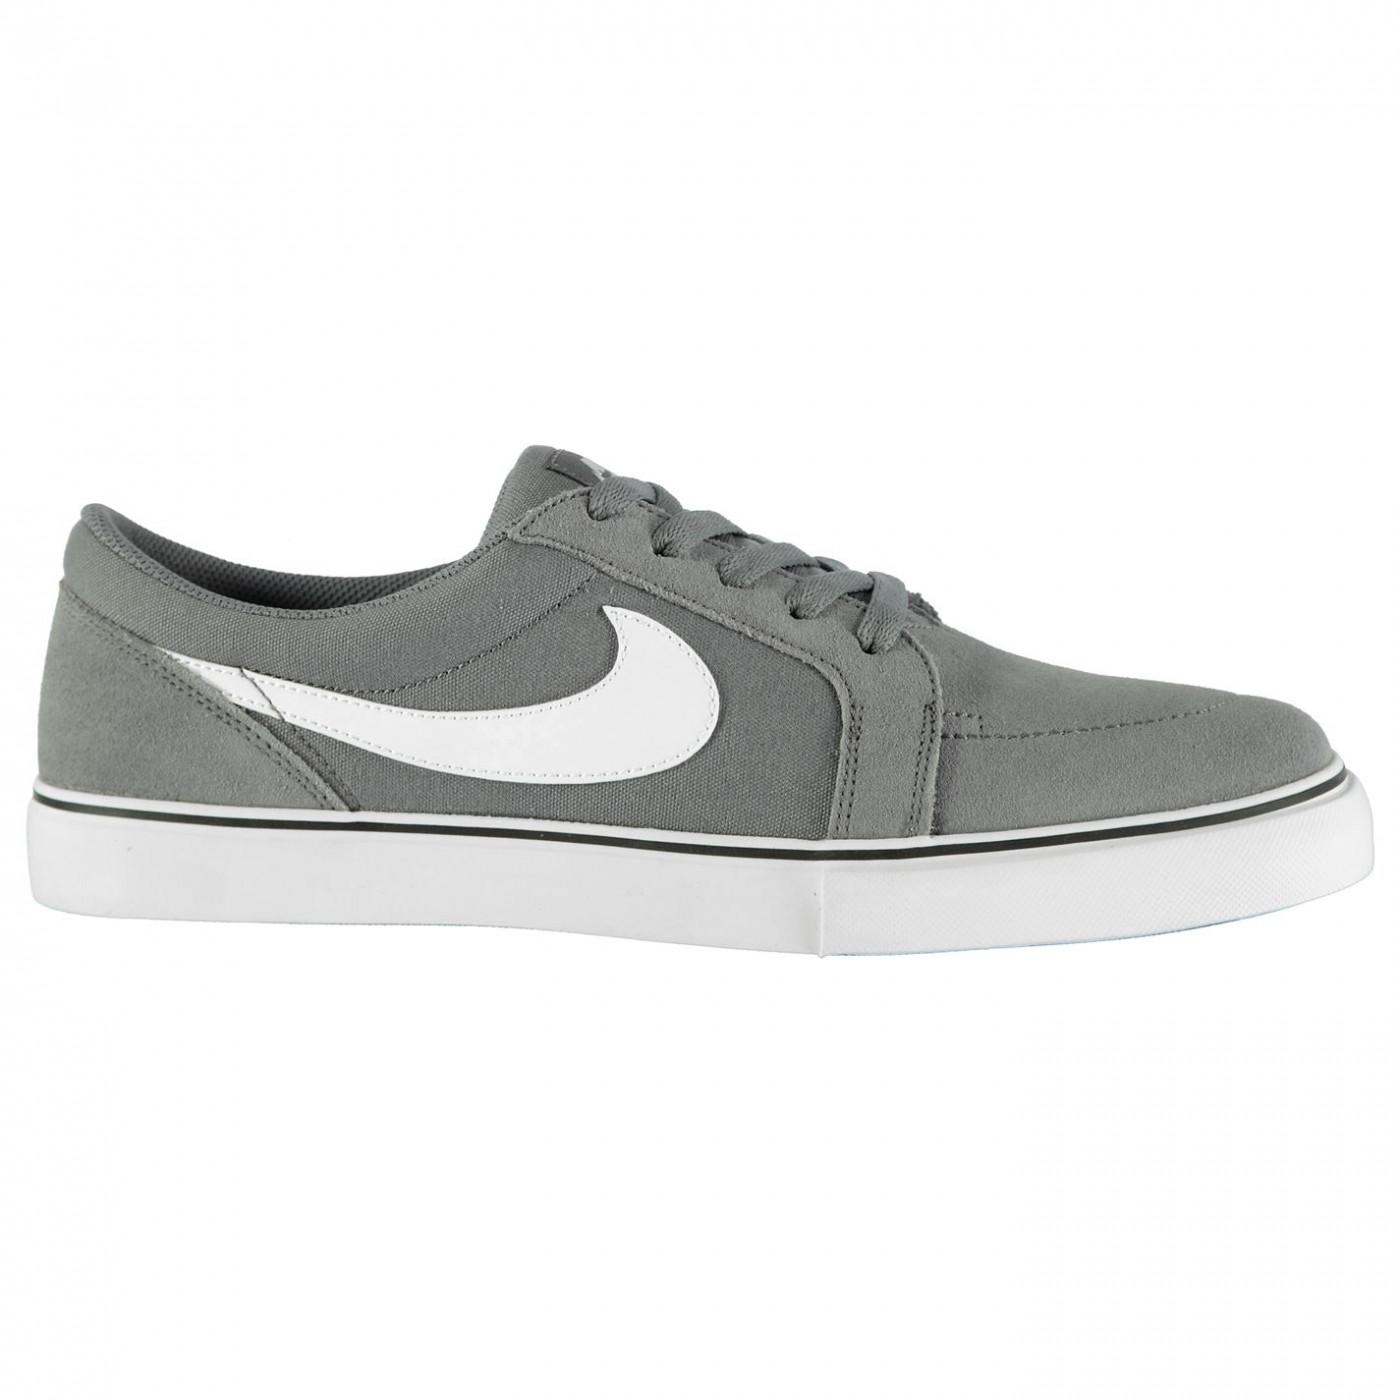 98838b12773 Nike SB Satire II Shoes Mens - FACTCOOL